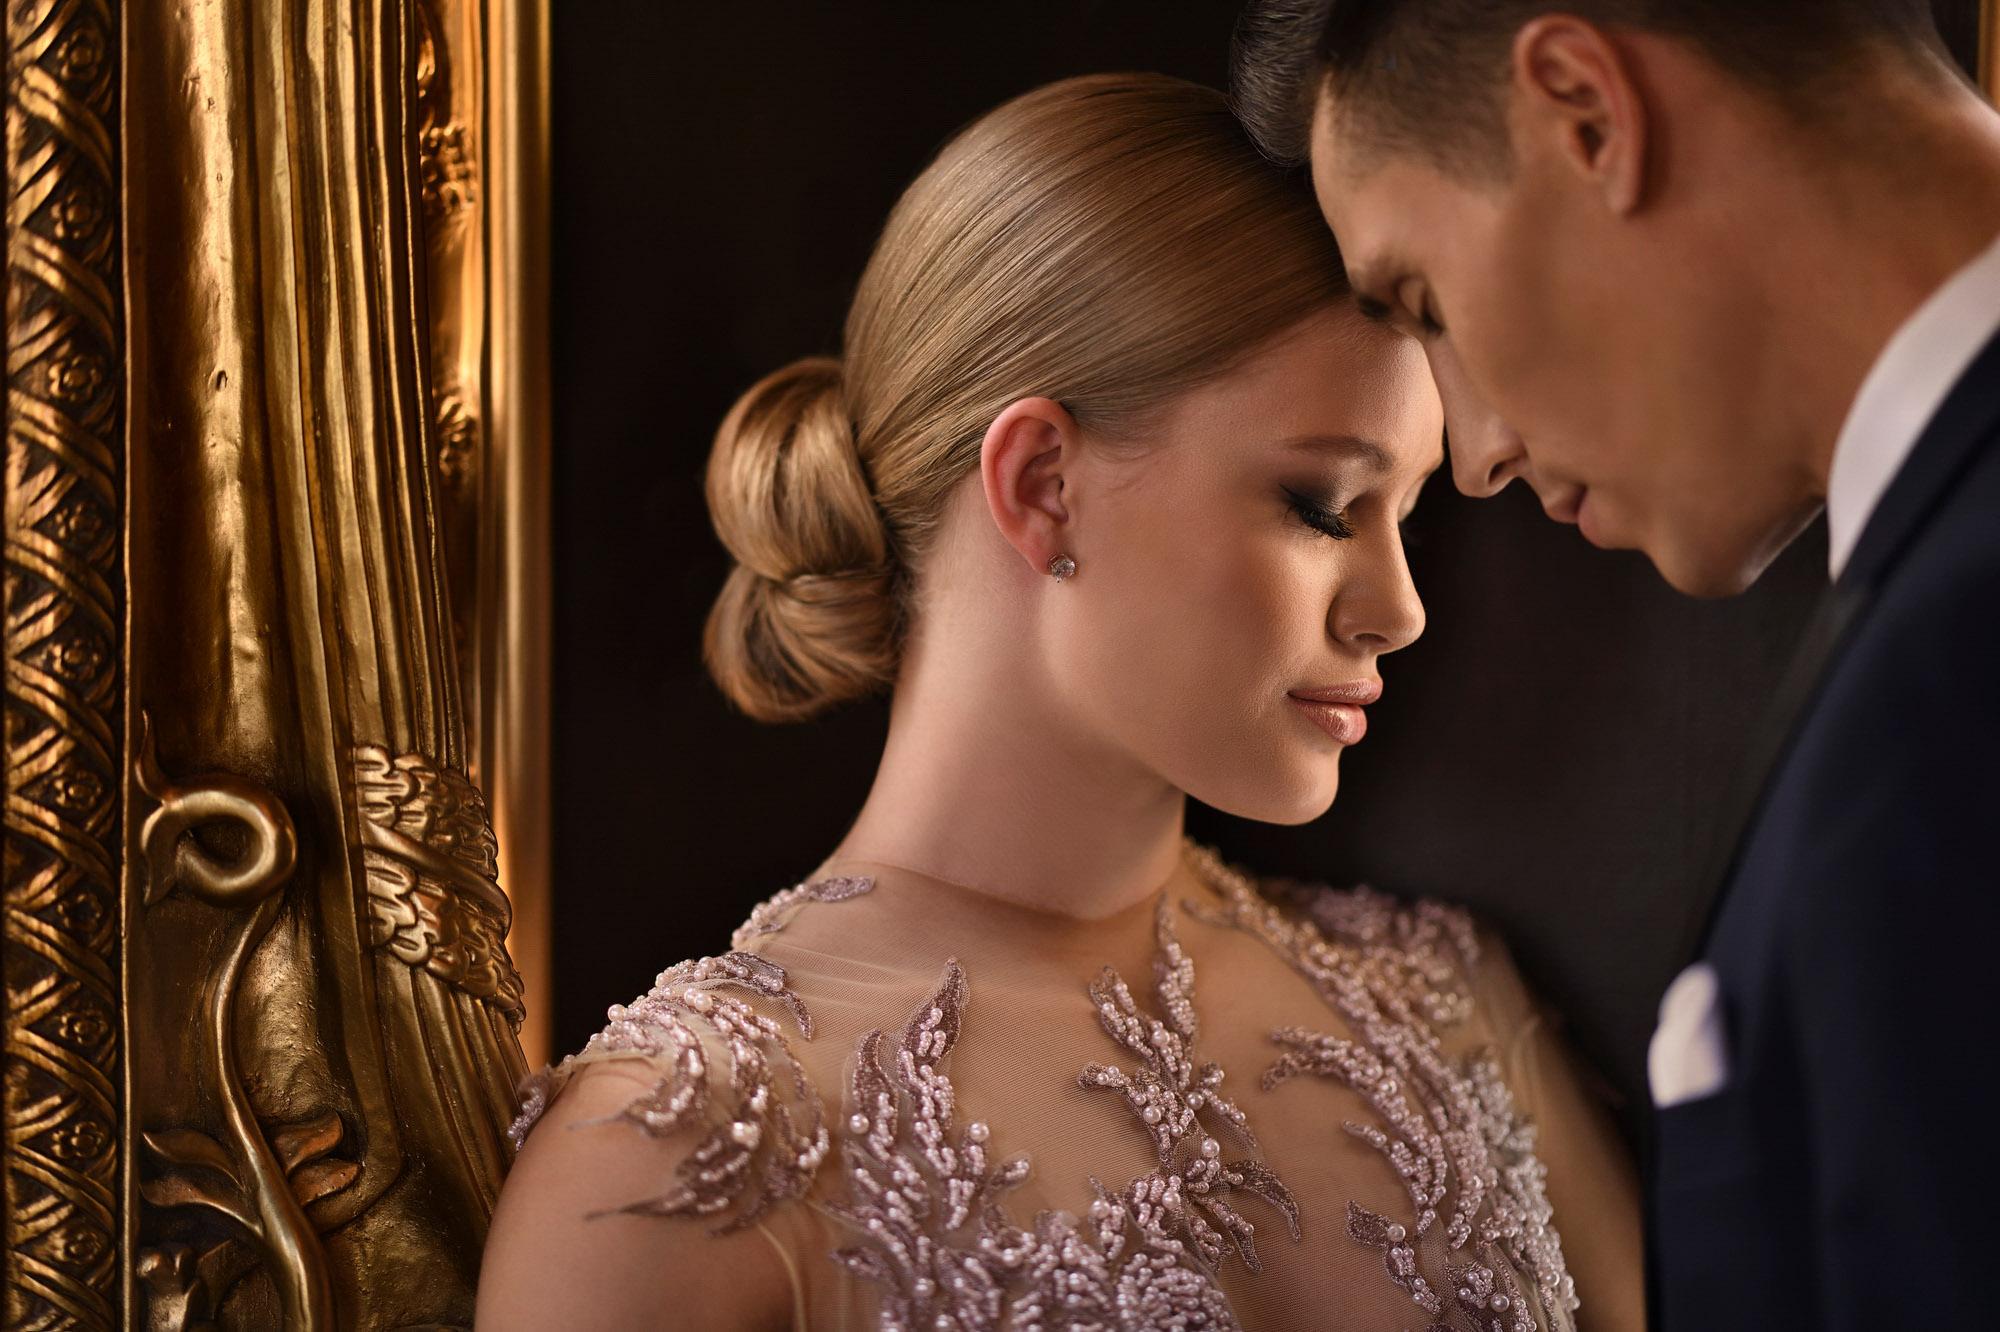 lassic-couple-bride-with-blonde-chignon-worlds-best-wedding-photos-jerry-ghionis-top-las-vegas-photographer